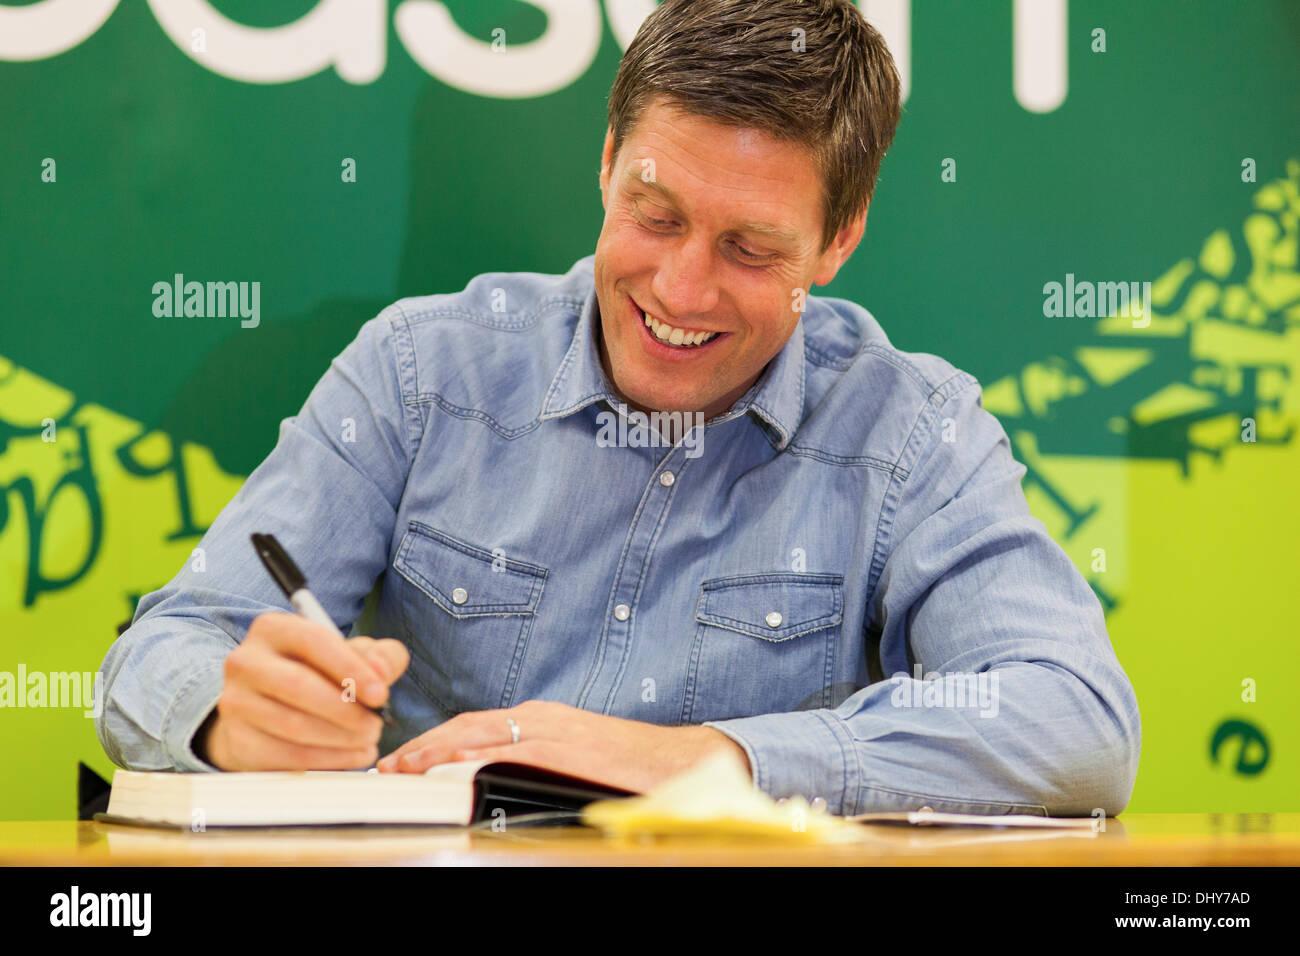 Ronan O' Gara signs copies of his second book in Dublin, Ireland - Stock Image